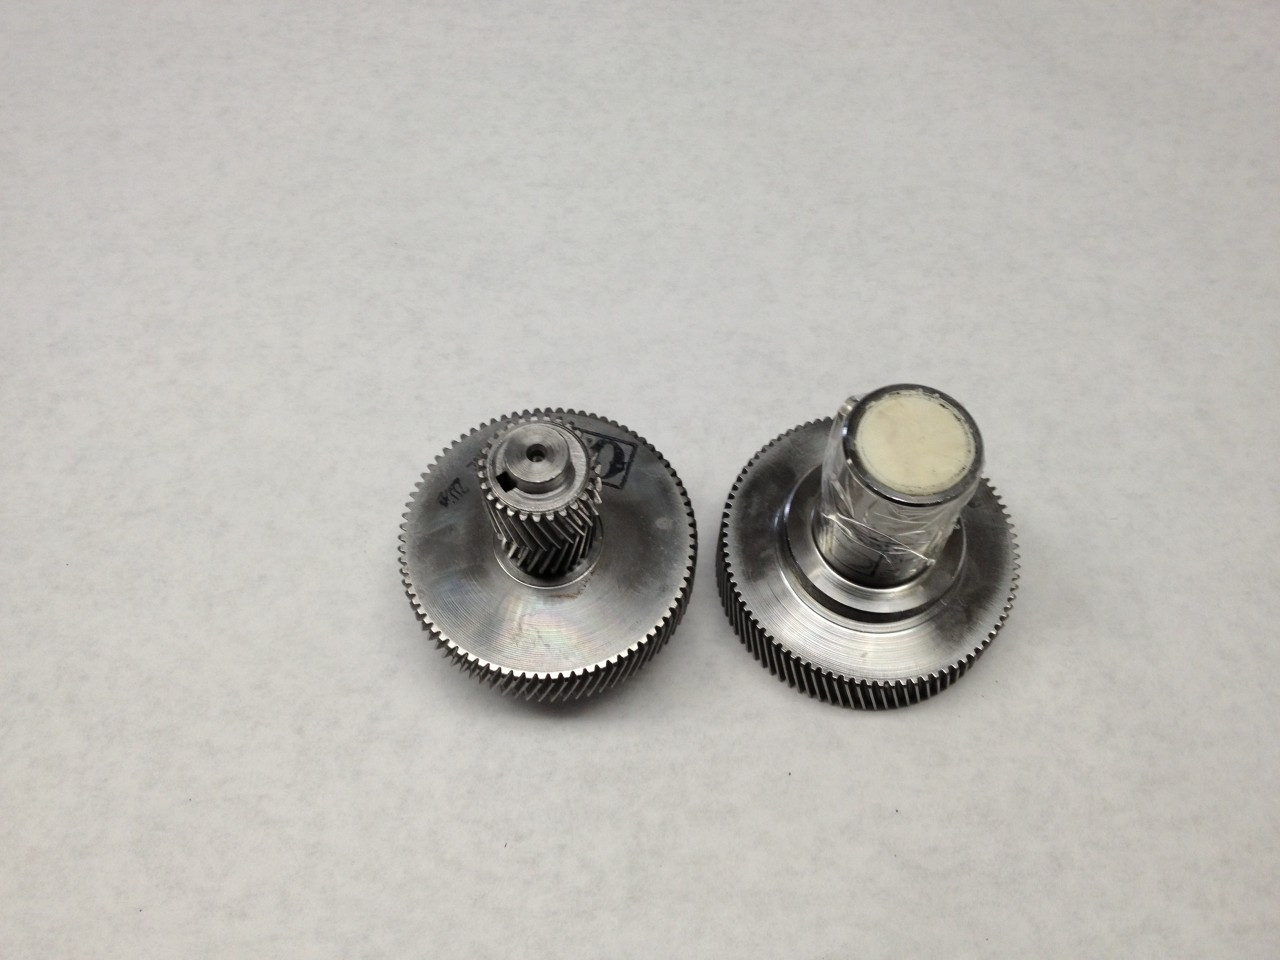 ProCut KG-22W-SS & KG-22W-XP-SS - Square Gear Kit - 05-72409